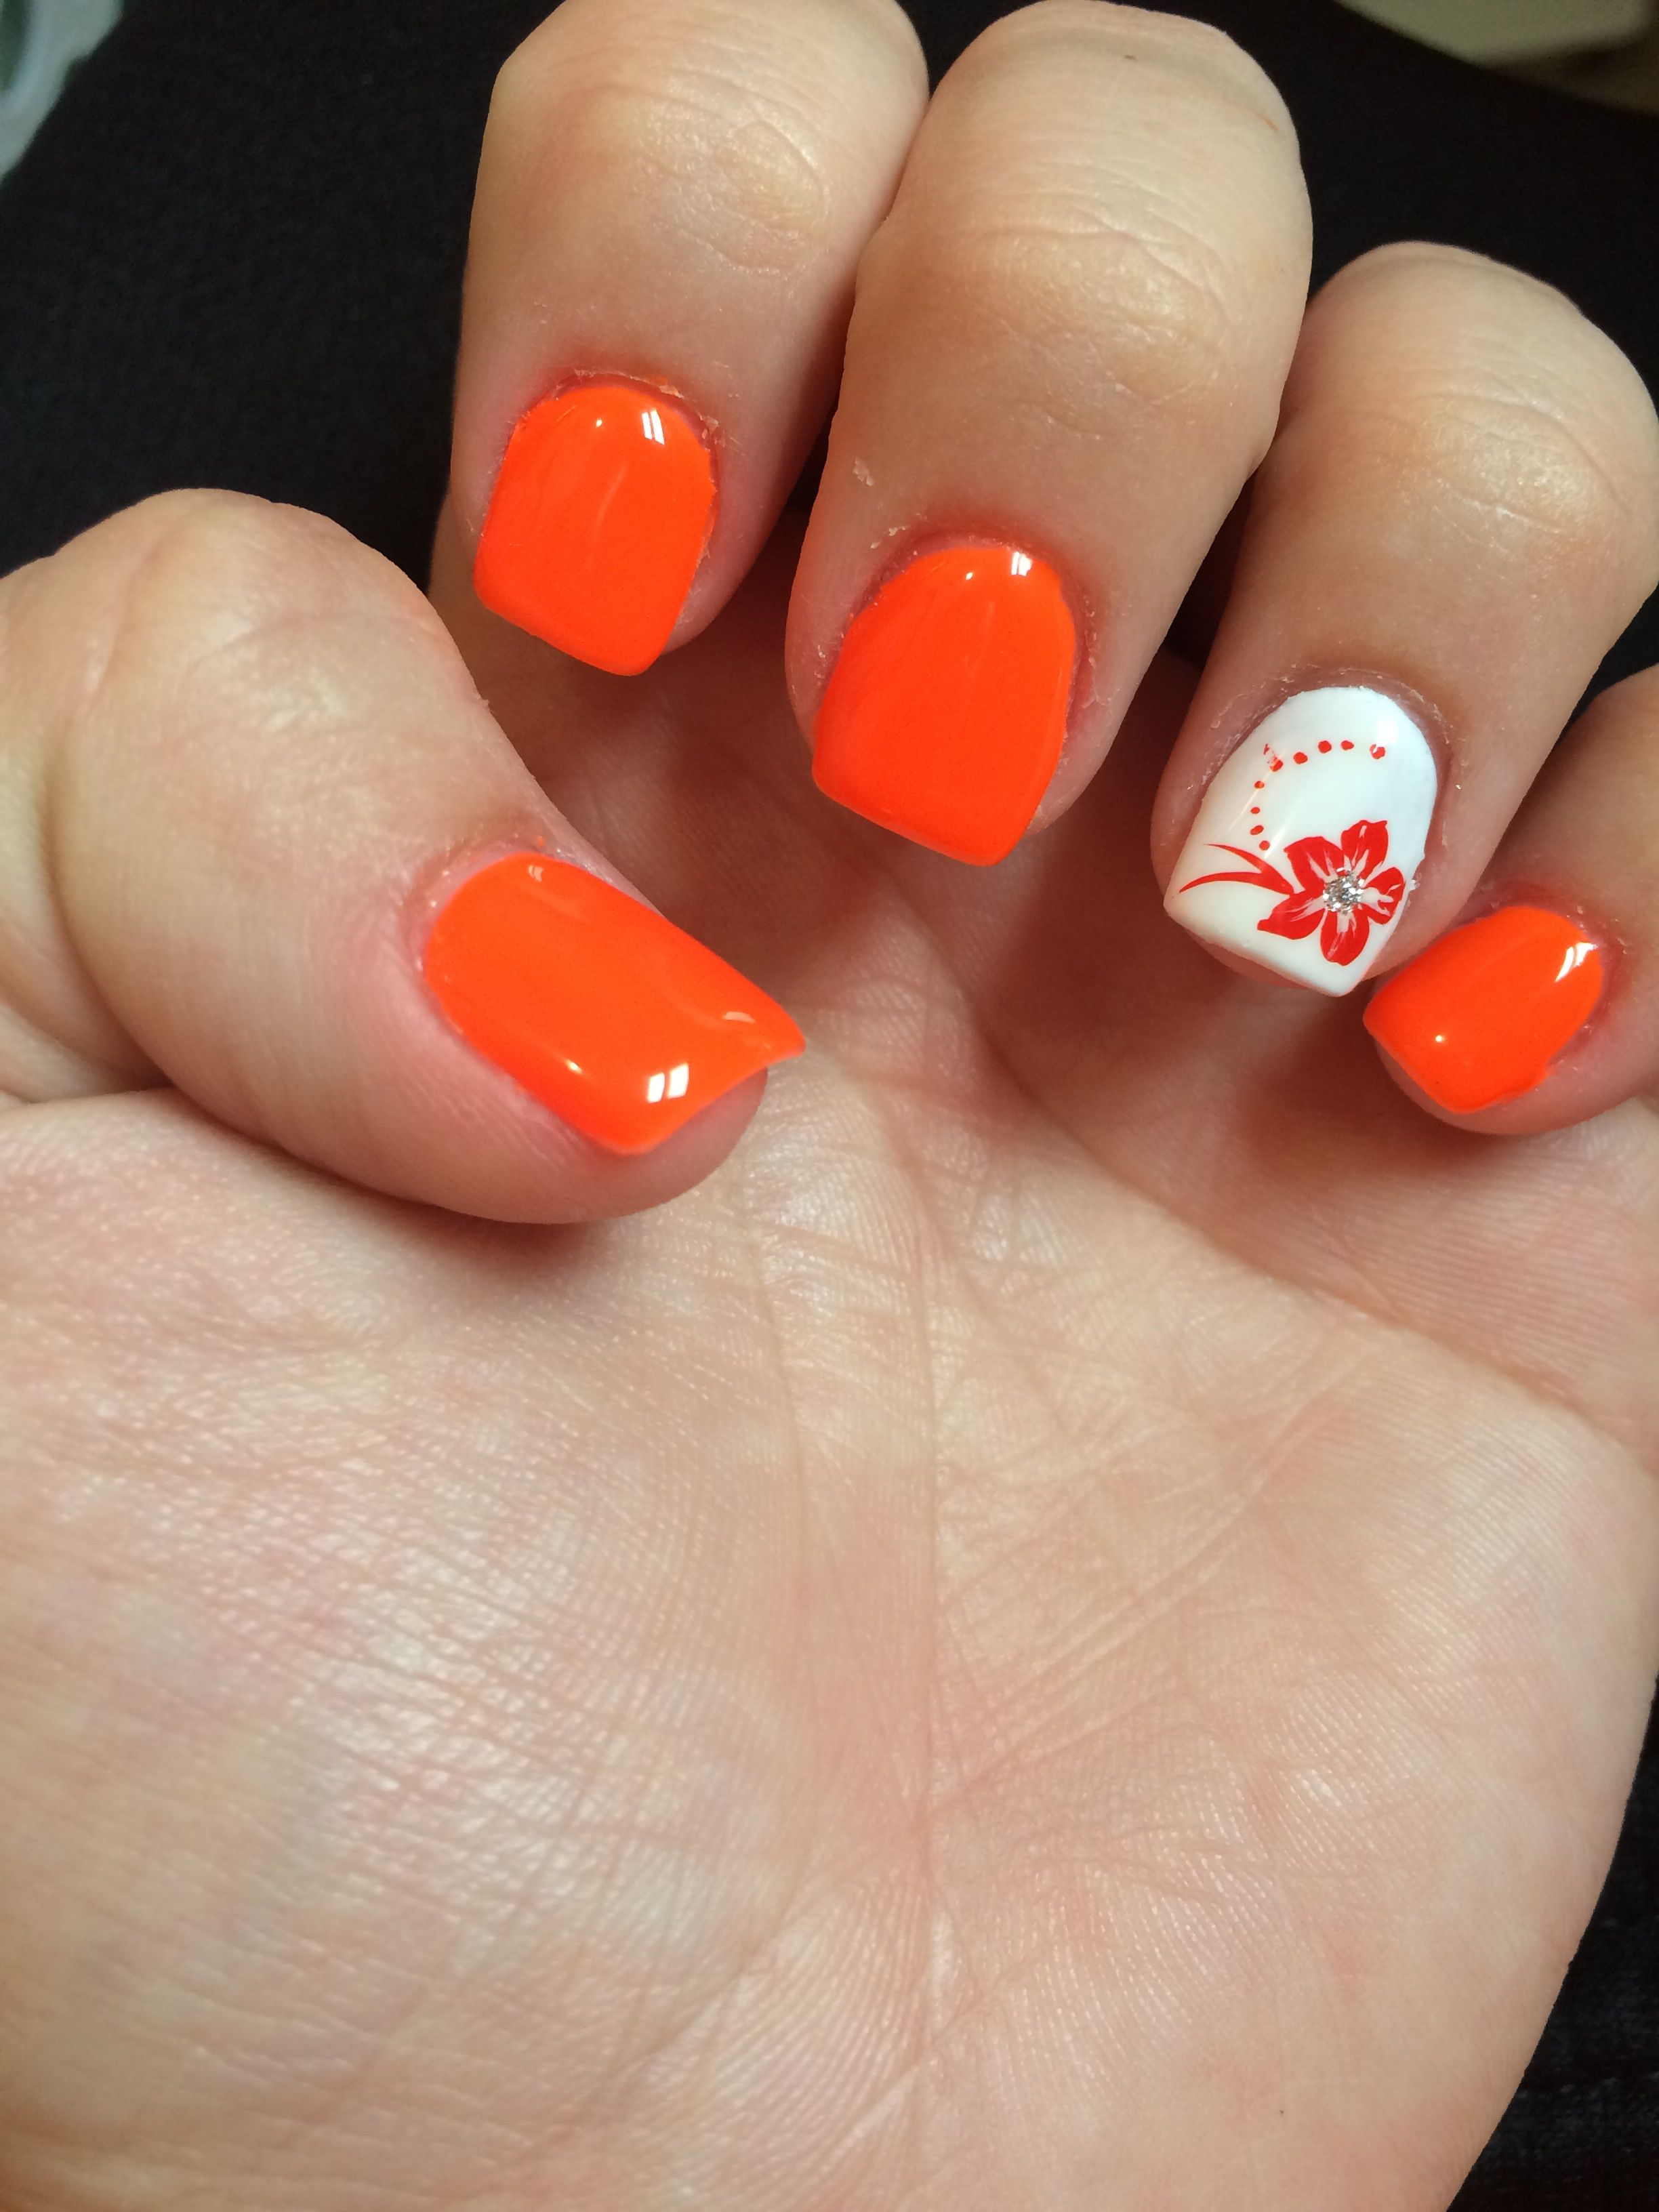 Neon Orange Nails With Flower Nail Art Pinterest Neon Orange